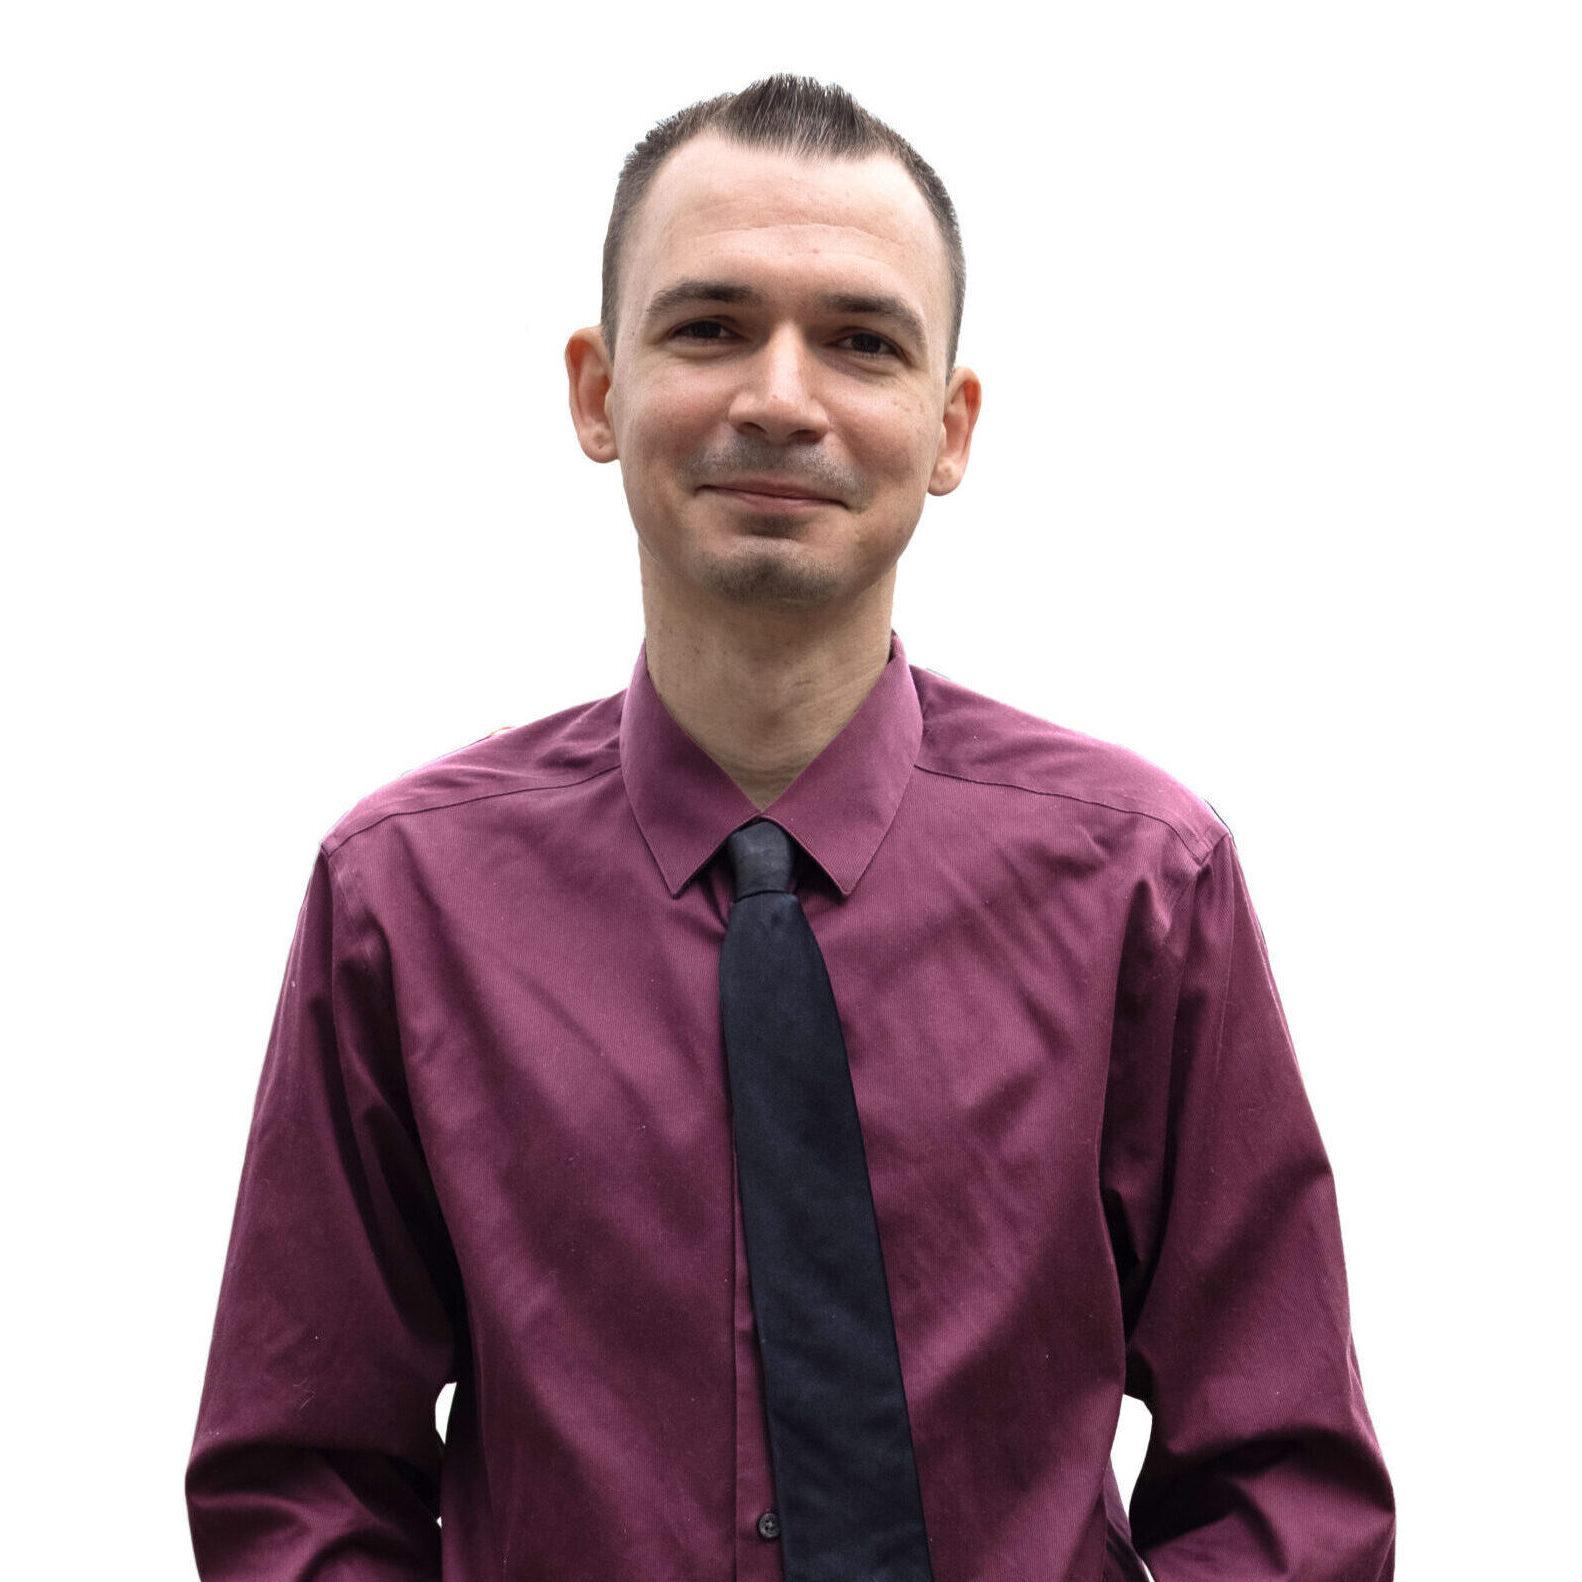 Chris Tuomey